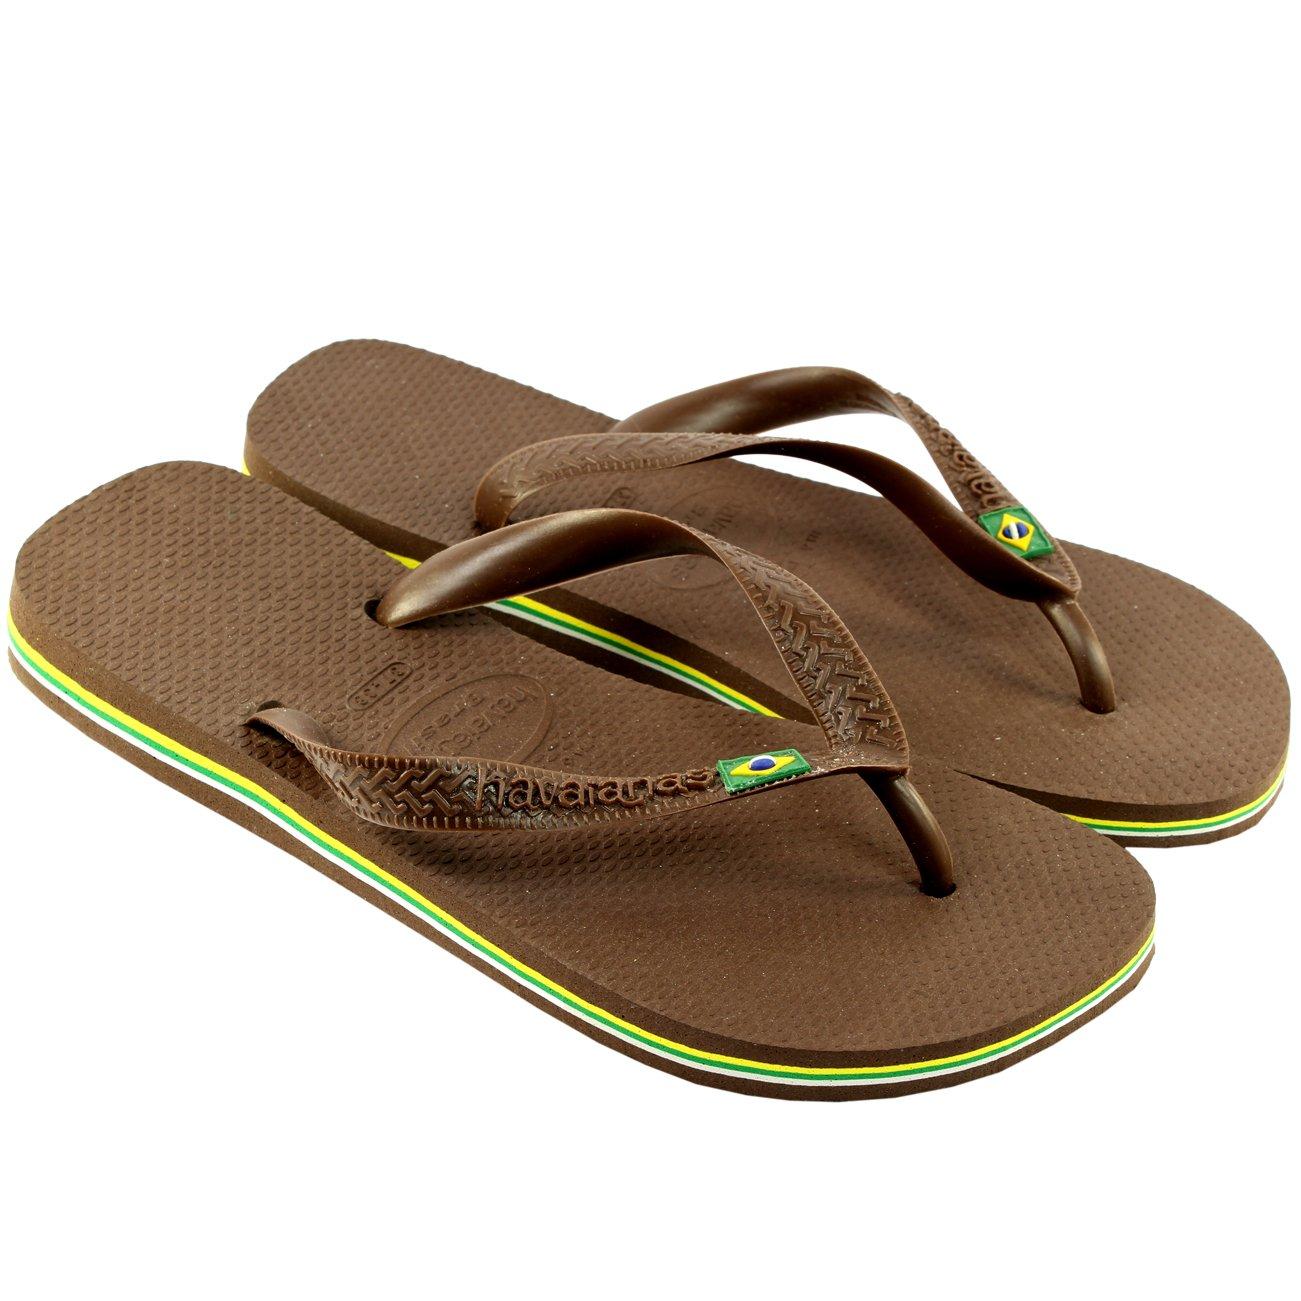 Herren Sandalen Havaianas Brasil Flip Flop Sandals  35/36 EU|Dunkelbraun